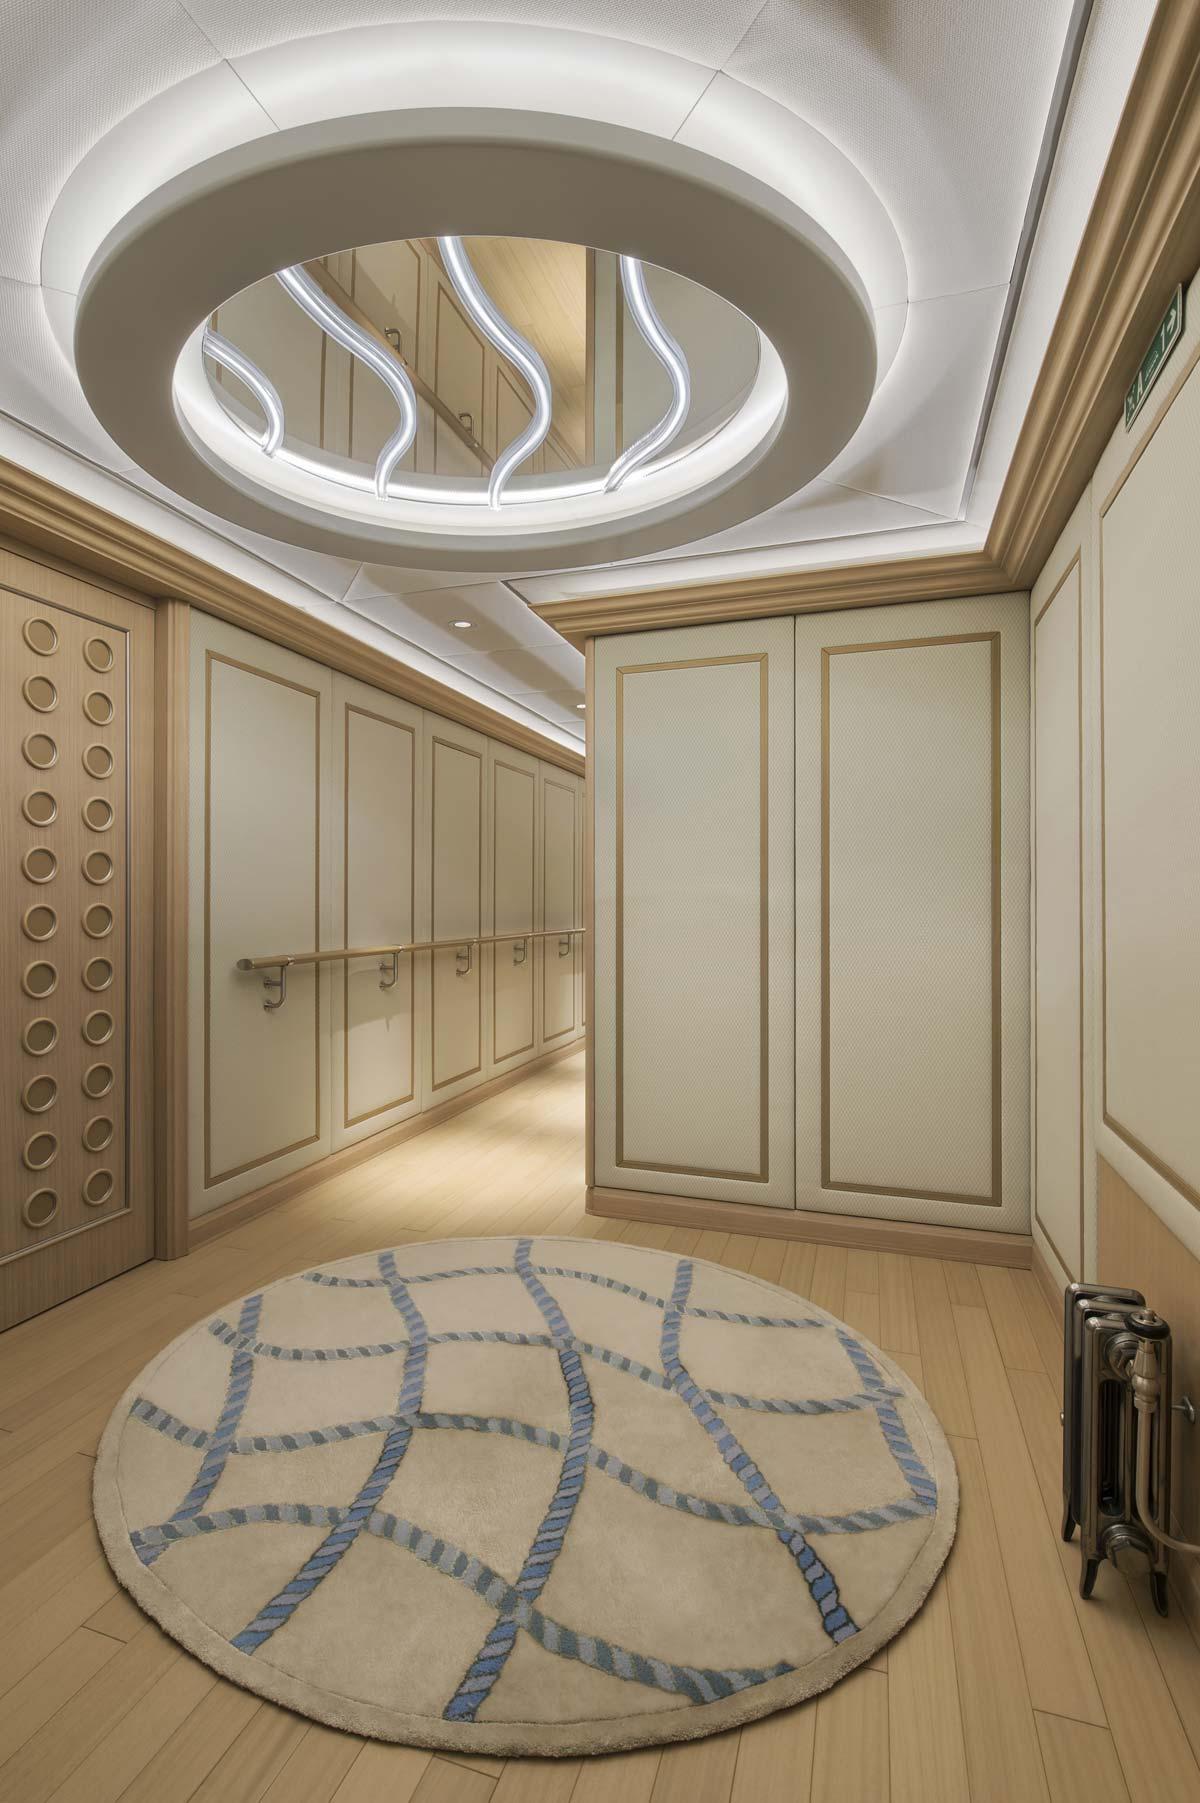 My Dream, interior design by Ciarmoli Queda